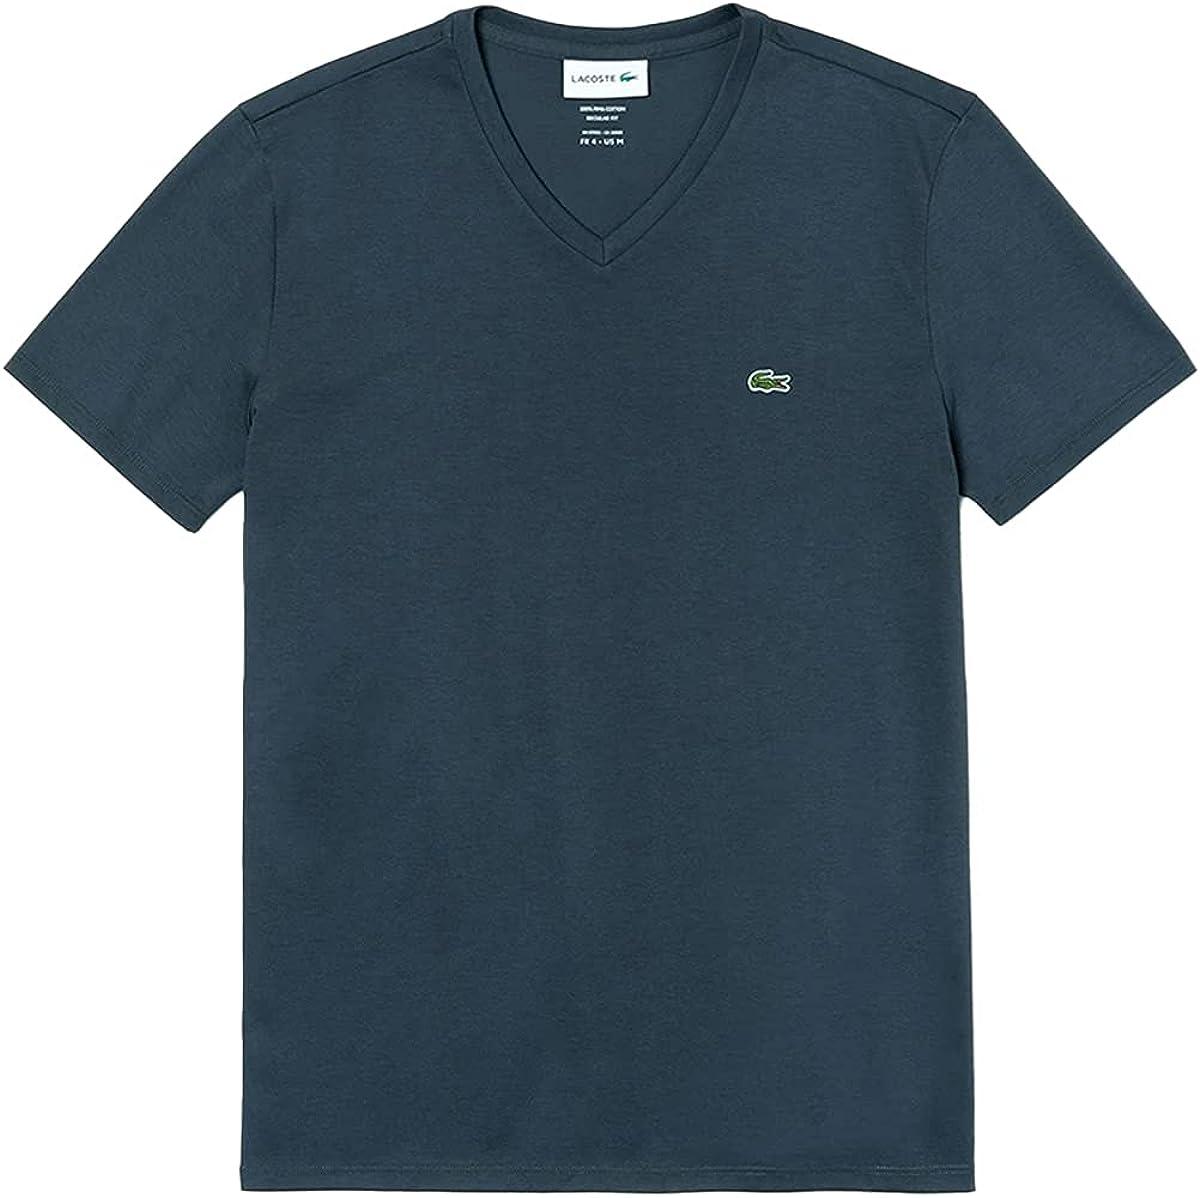 Cheap bargain Lacoste Mens V-Neck Pima Cotton Ranking TOP3 Sleeve T-Shirt TH6710 Short